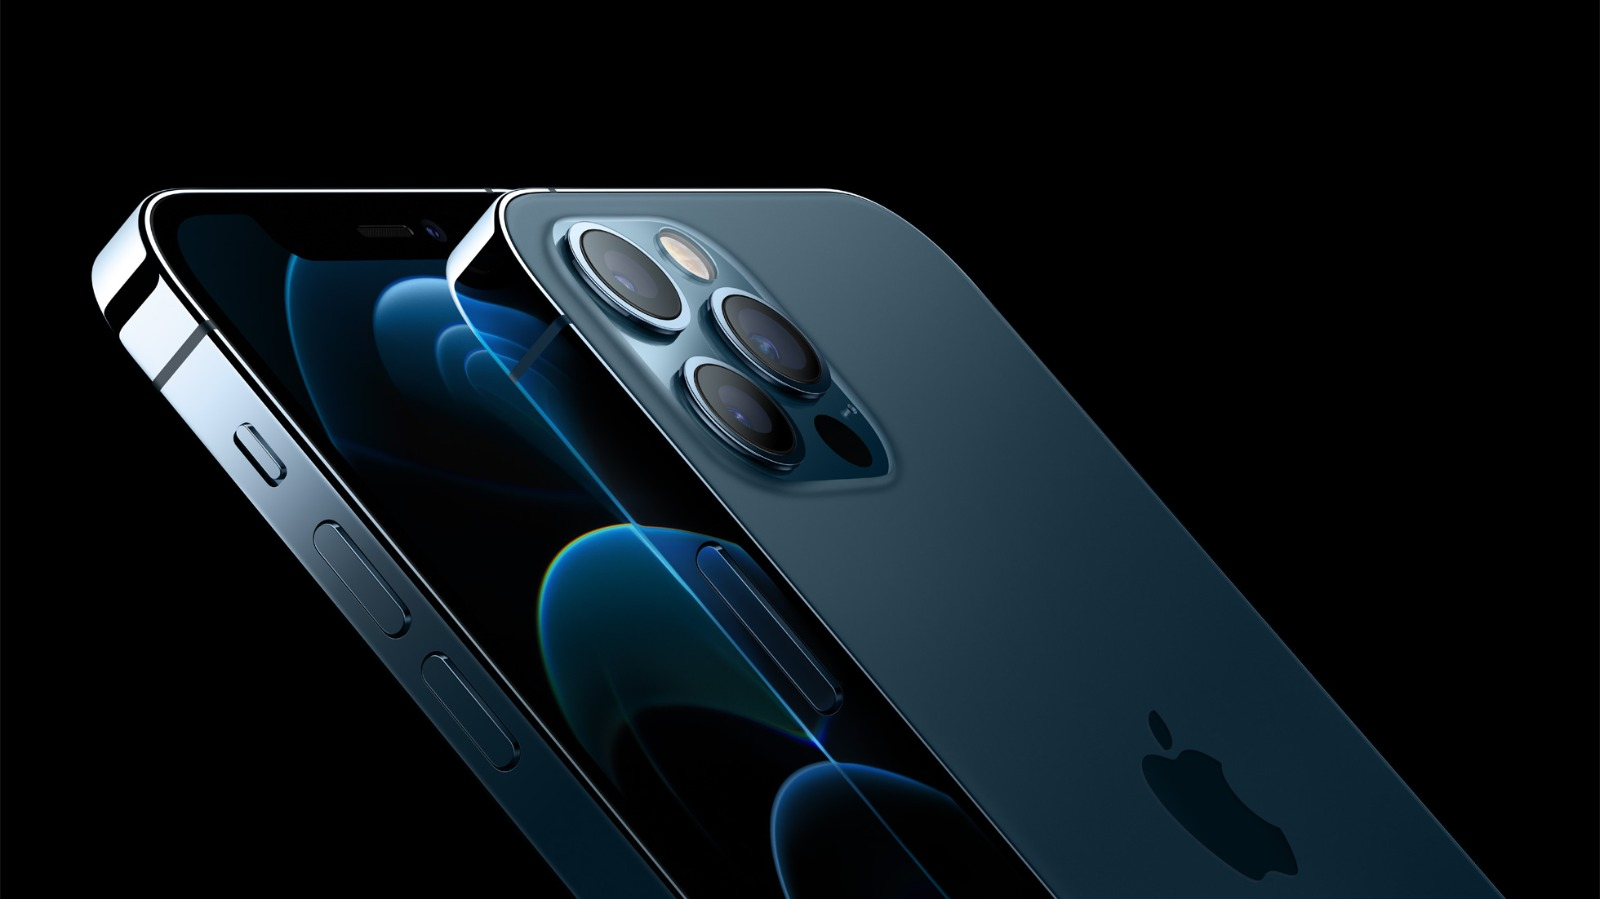 iPhone 12系列16日於大陸開放預購,開始不久,各電商平台就遭搶購一空,極速售罄。(蘋果官網)